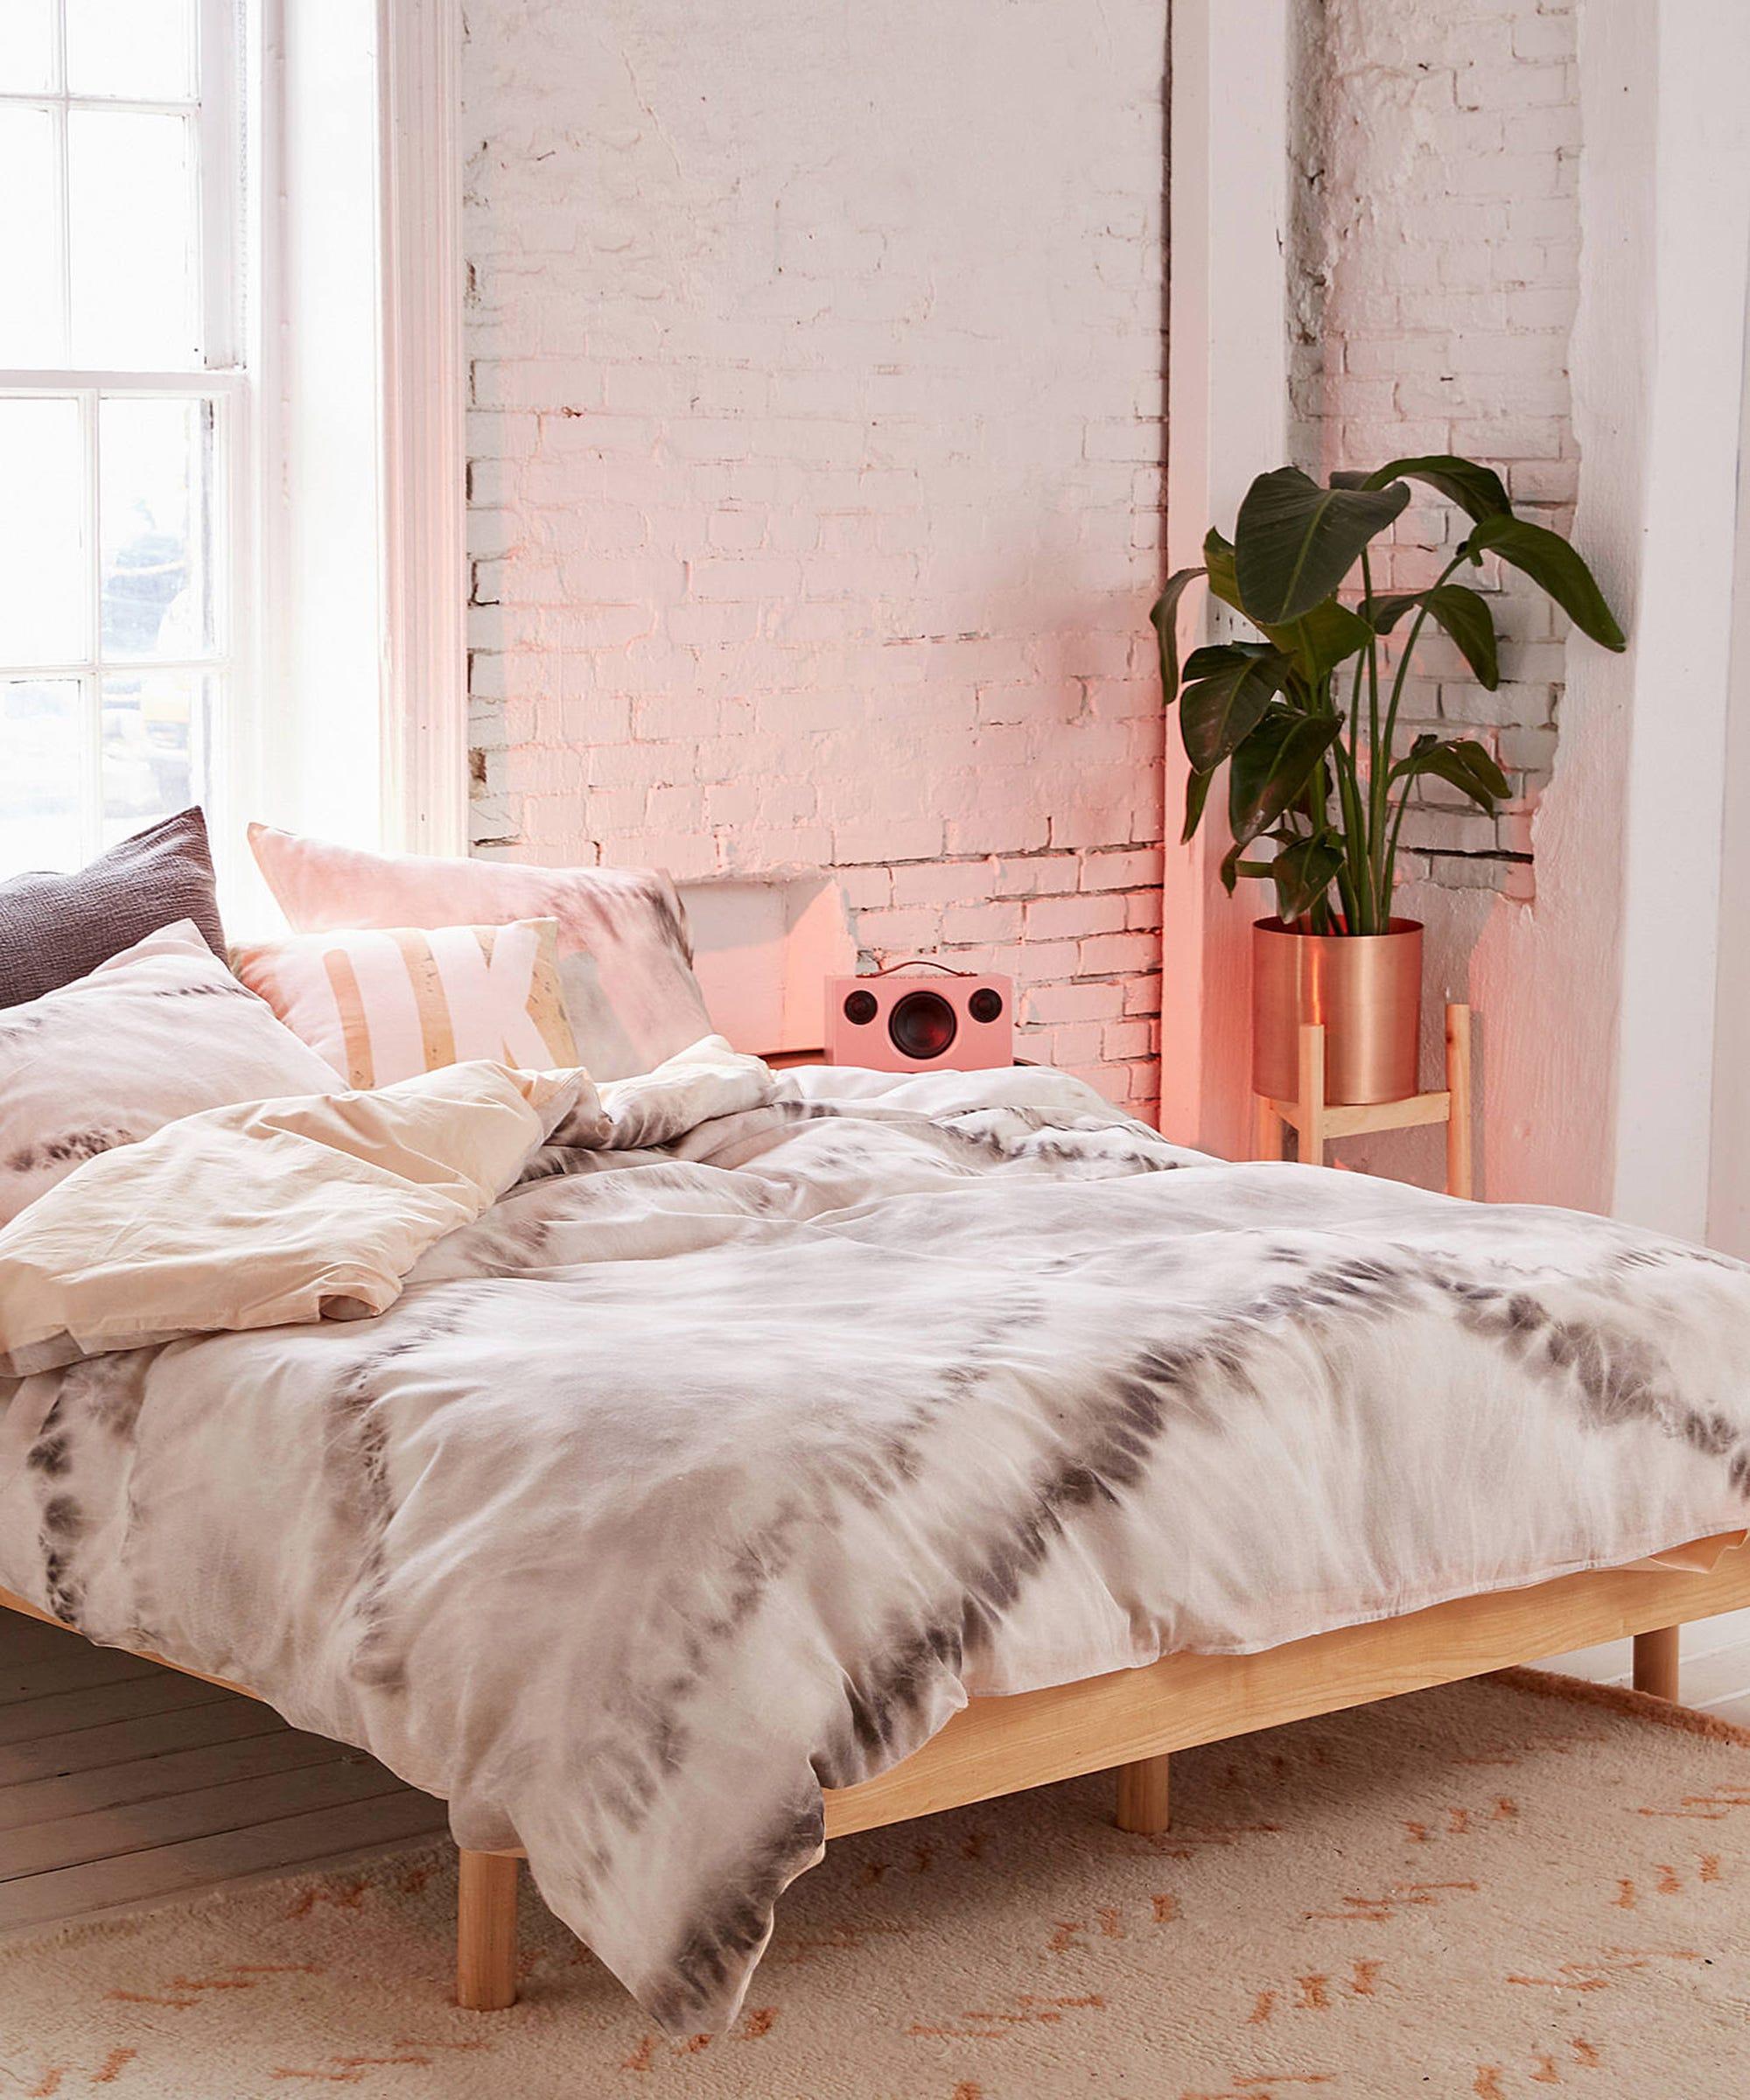 Twin Xl Bedding Sets Dorm Room Sheets Comforters